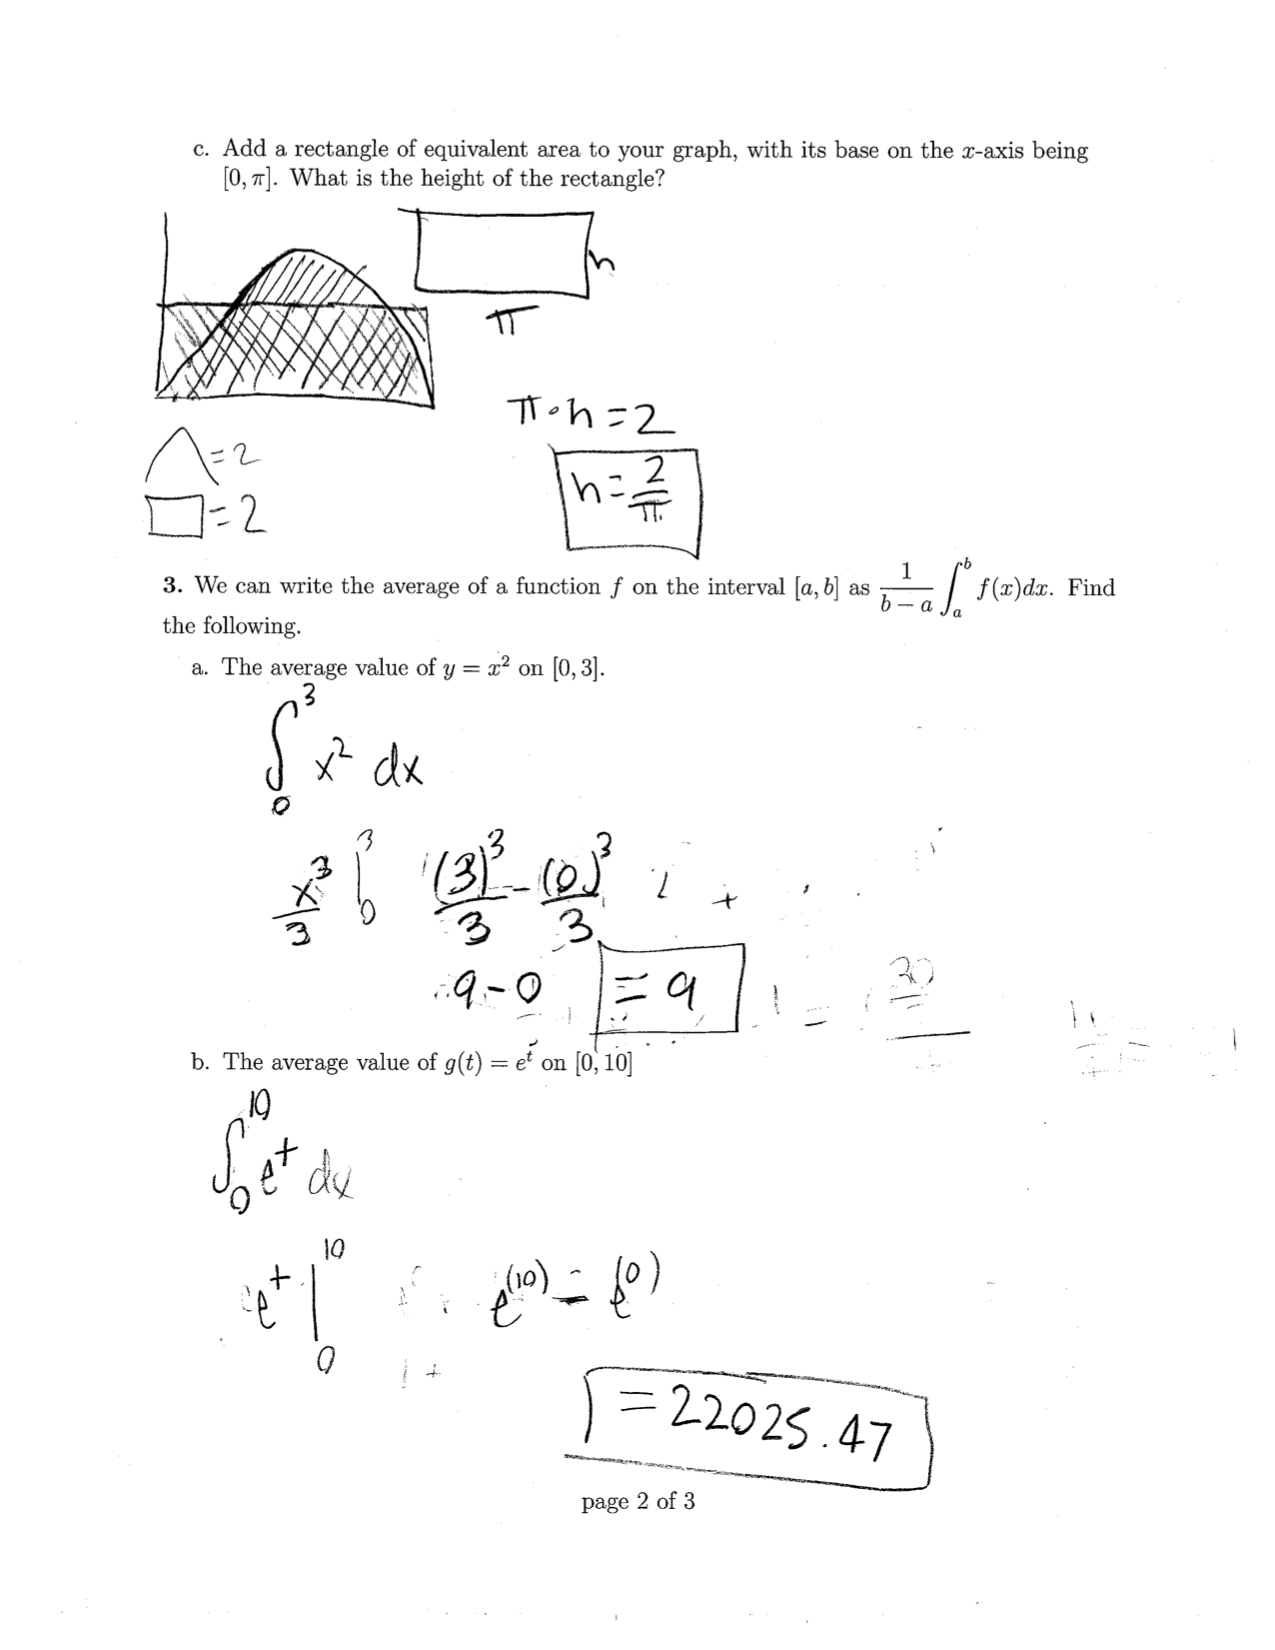 Zpattersoncalculus